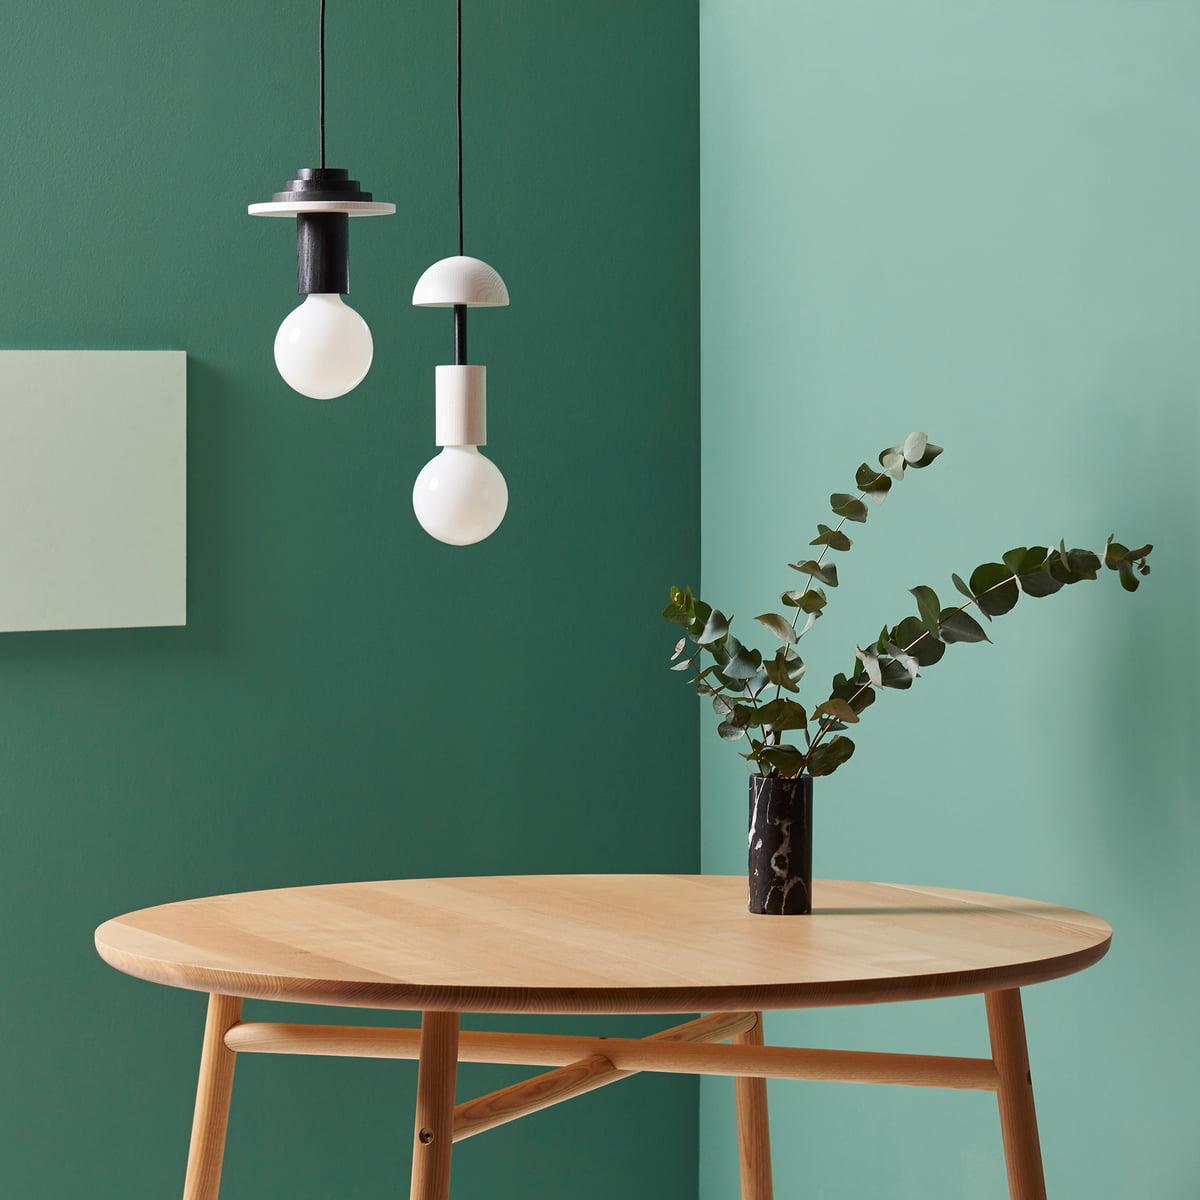 suspension lumineuse junit lamp de schneid. Black Bedroom Furniture Sets. Home Design Ideas